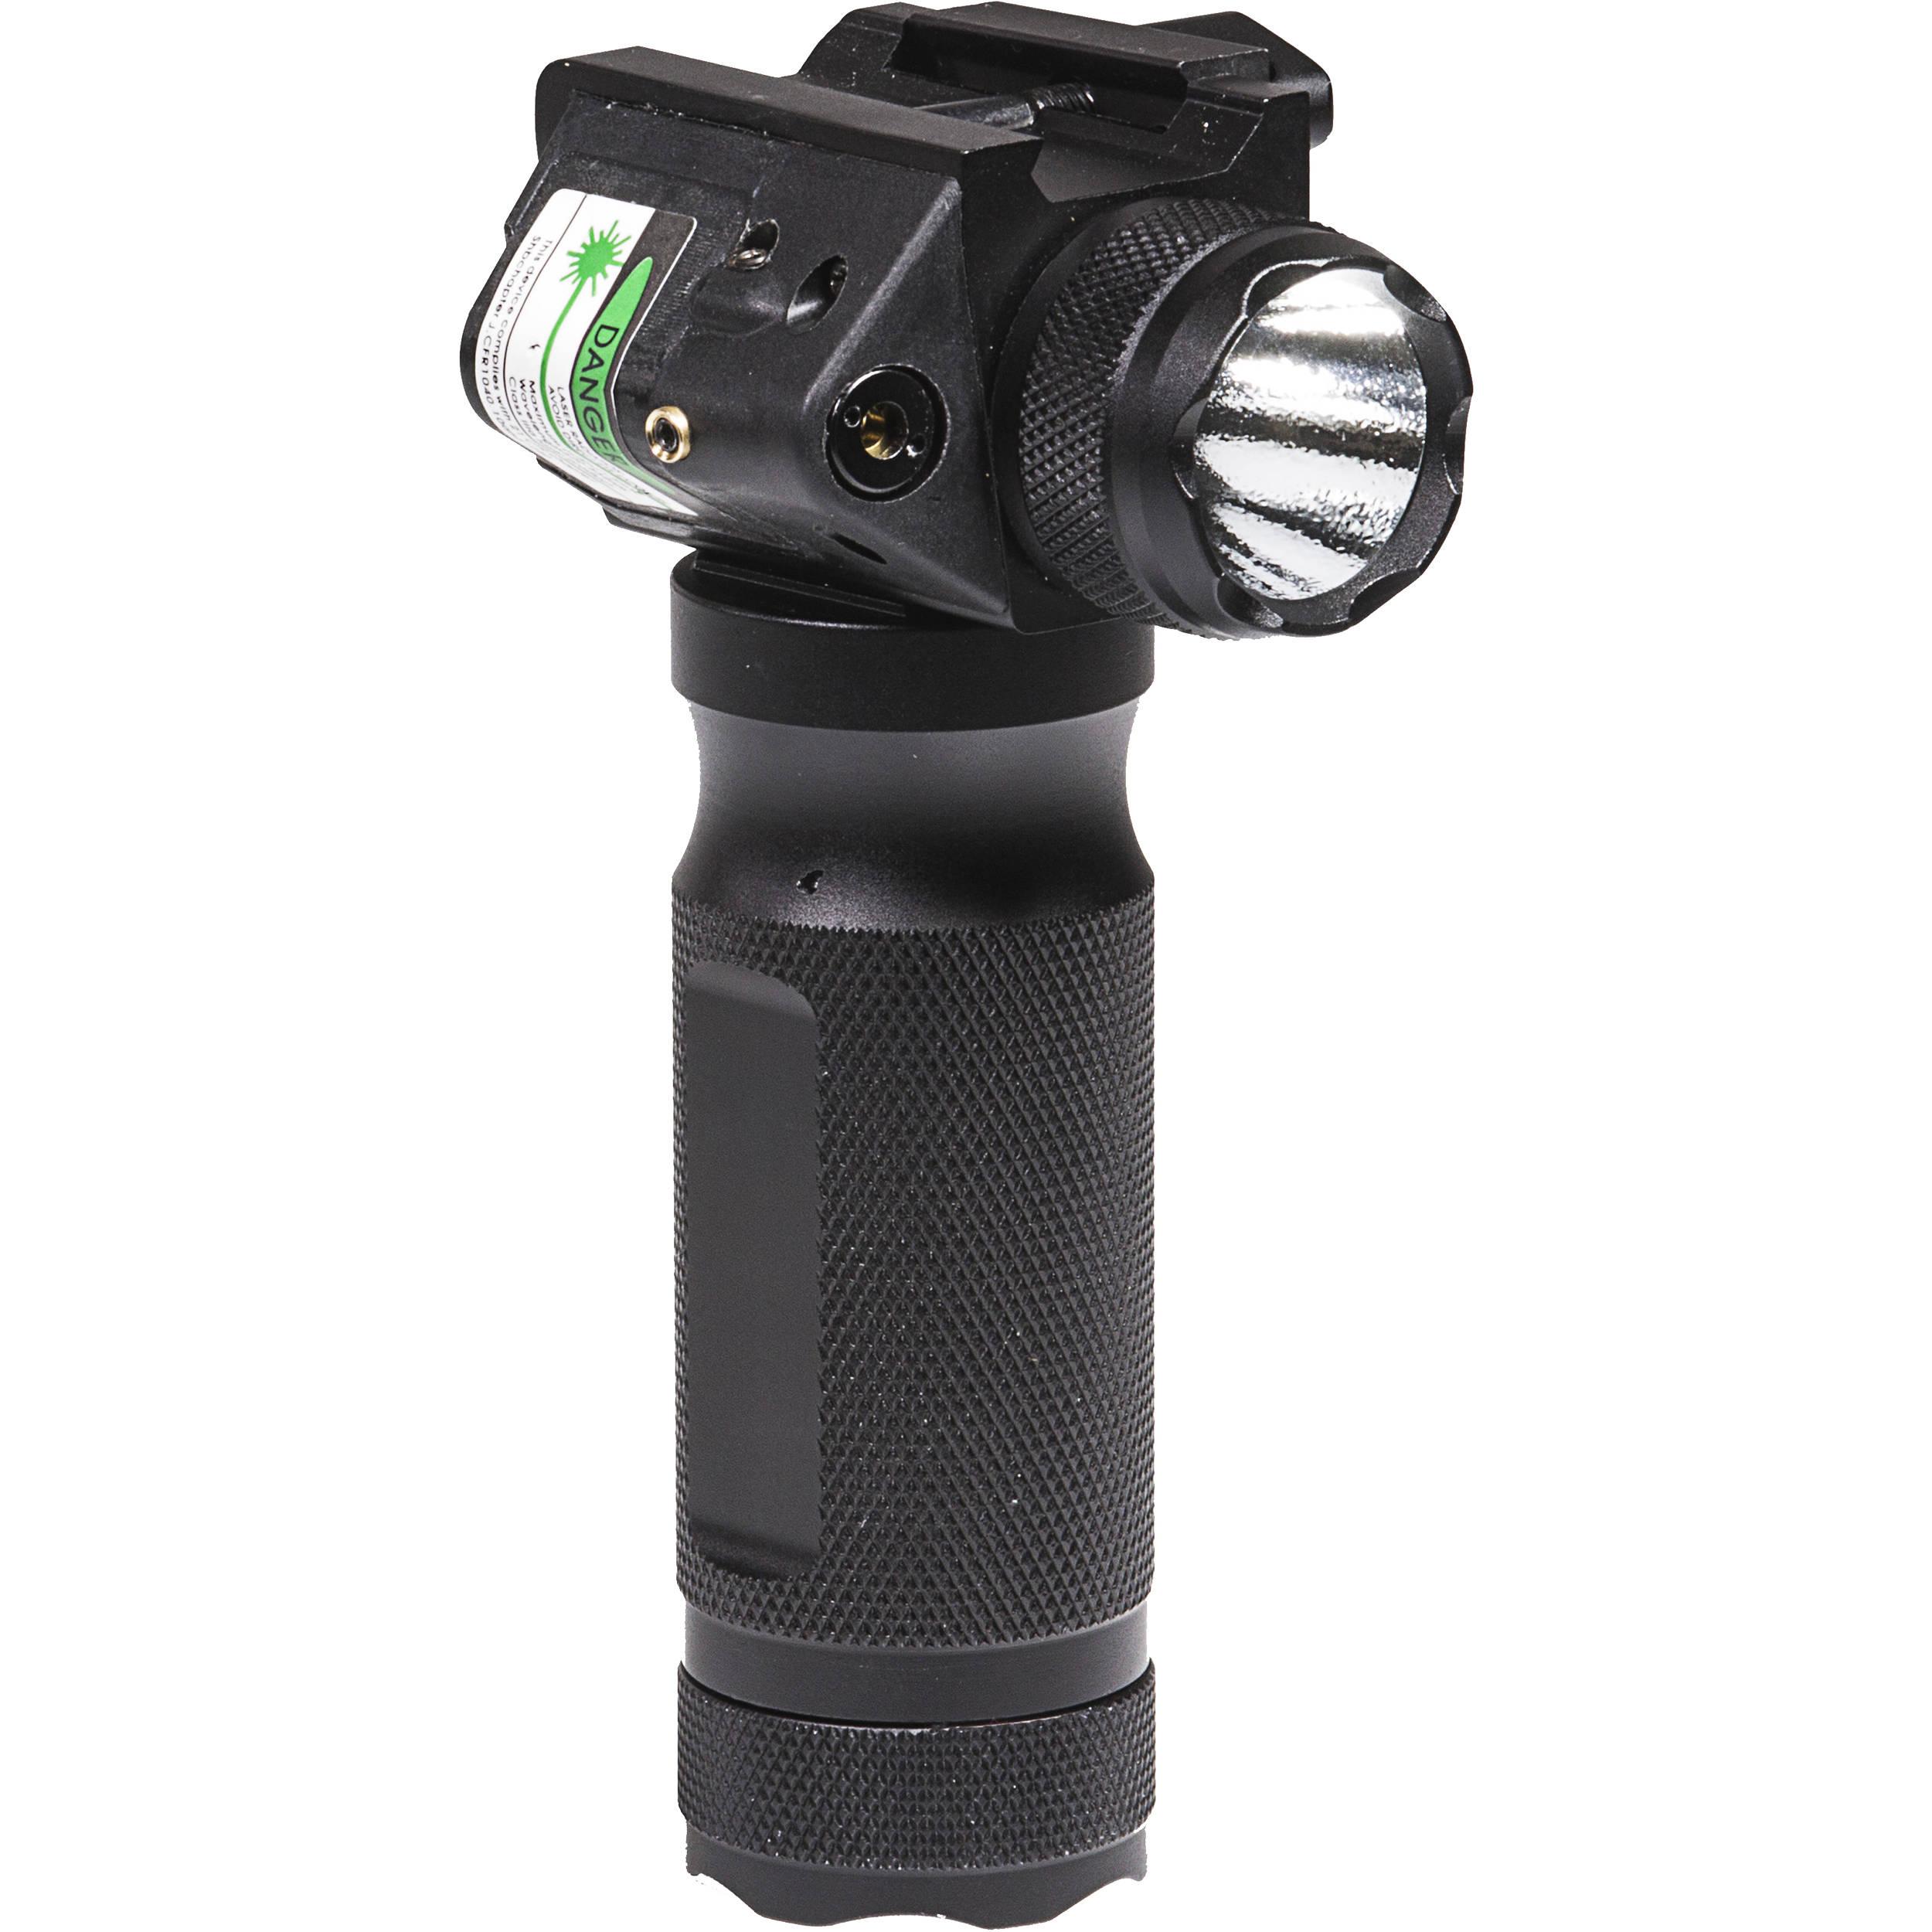 Firefield Heavy Duty Green Laser Flashlight Foregrip Ff35003 Bh Theus Pointer Matte Black